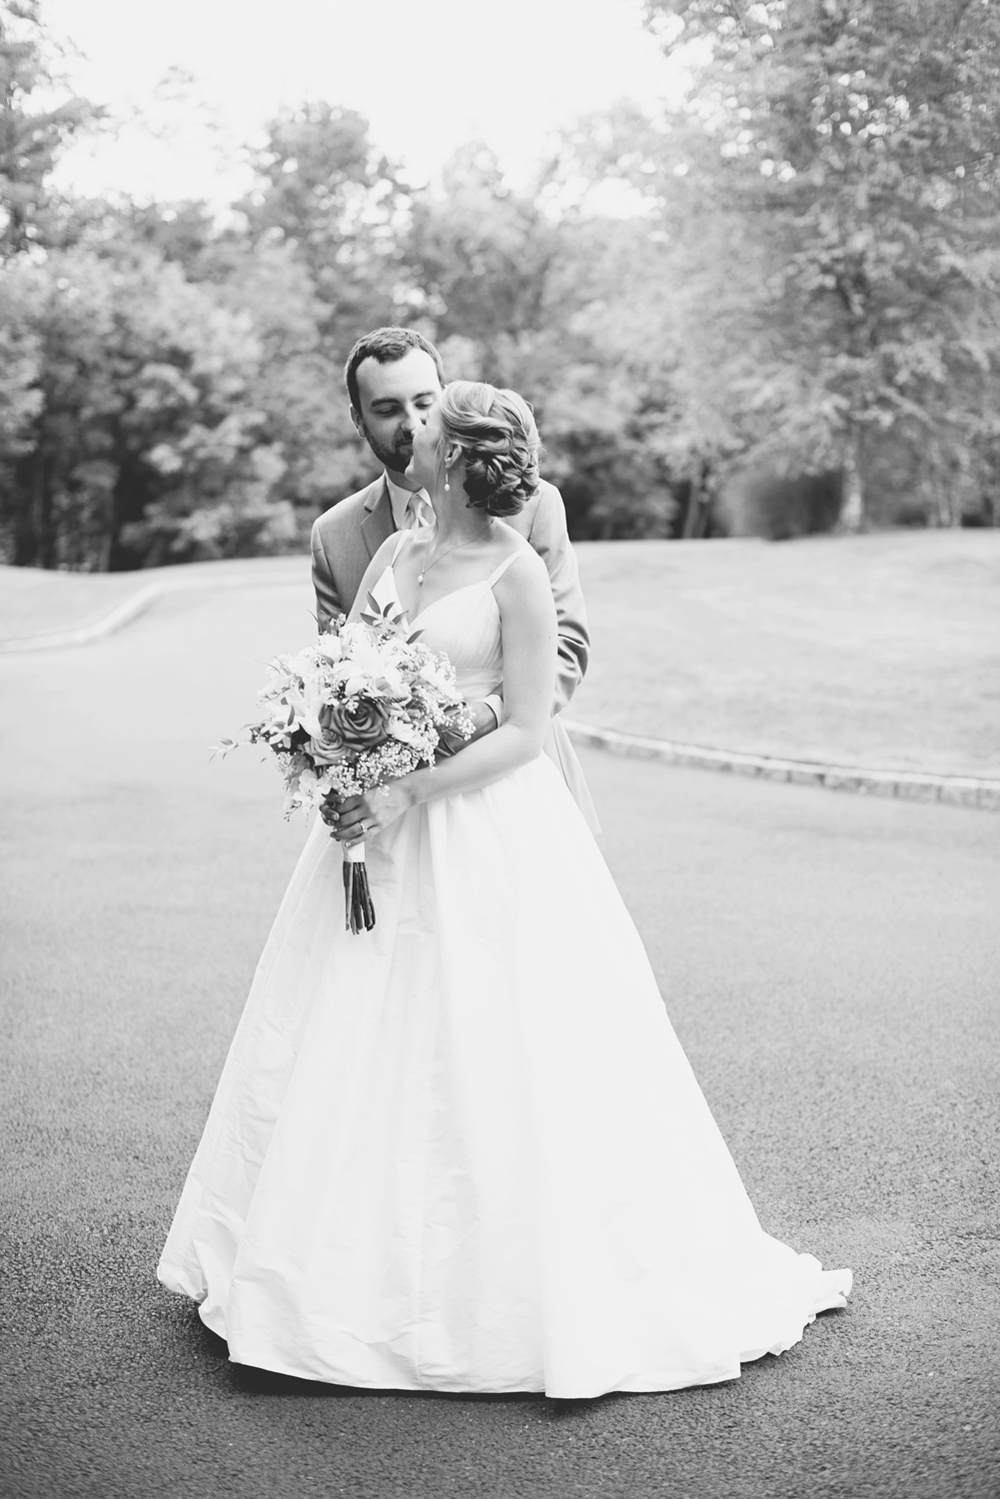 Trump National Golf Club Wedding | Washington, DC Wedding | Bride and groom portraits | Black and white